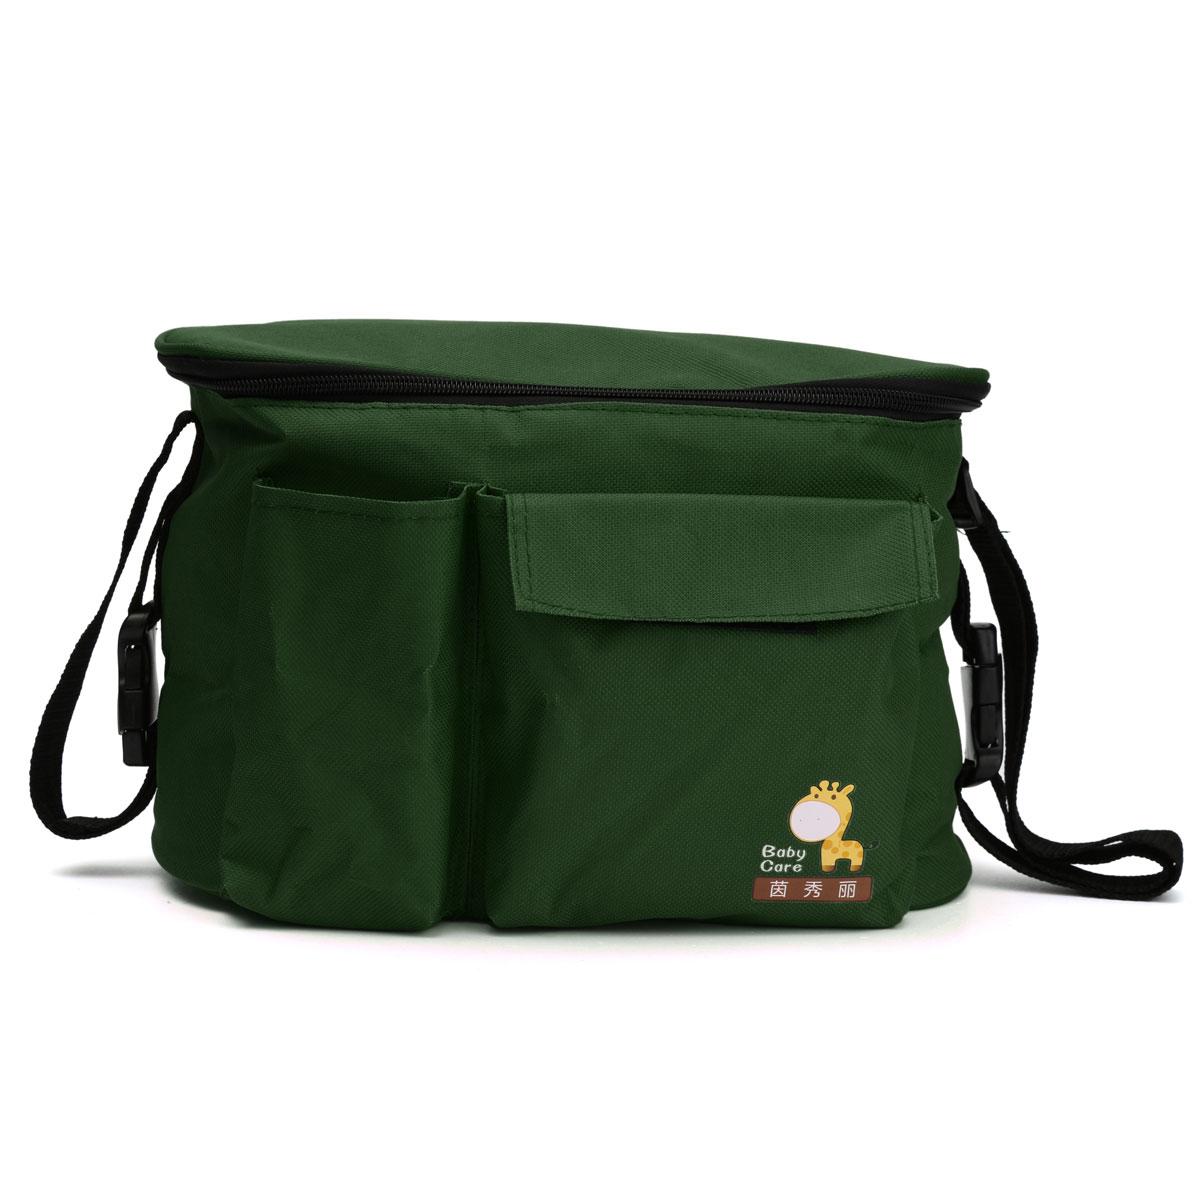 windeltasche kindertasche wickeltasche babytasche. Black Bedroom Furniture Sets. Home Design Ideas